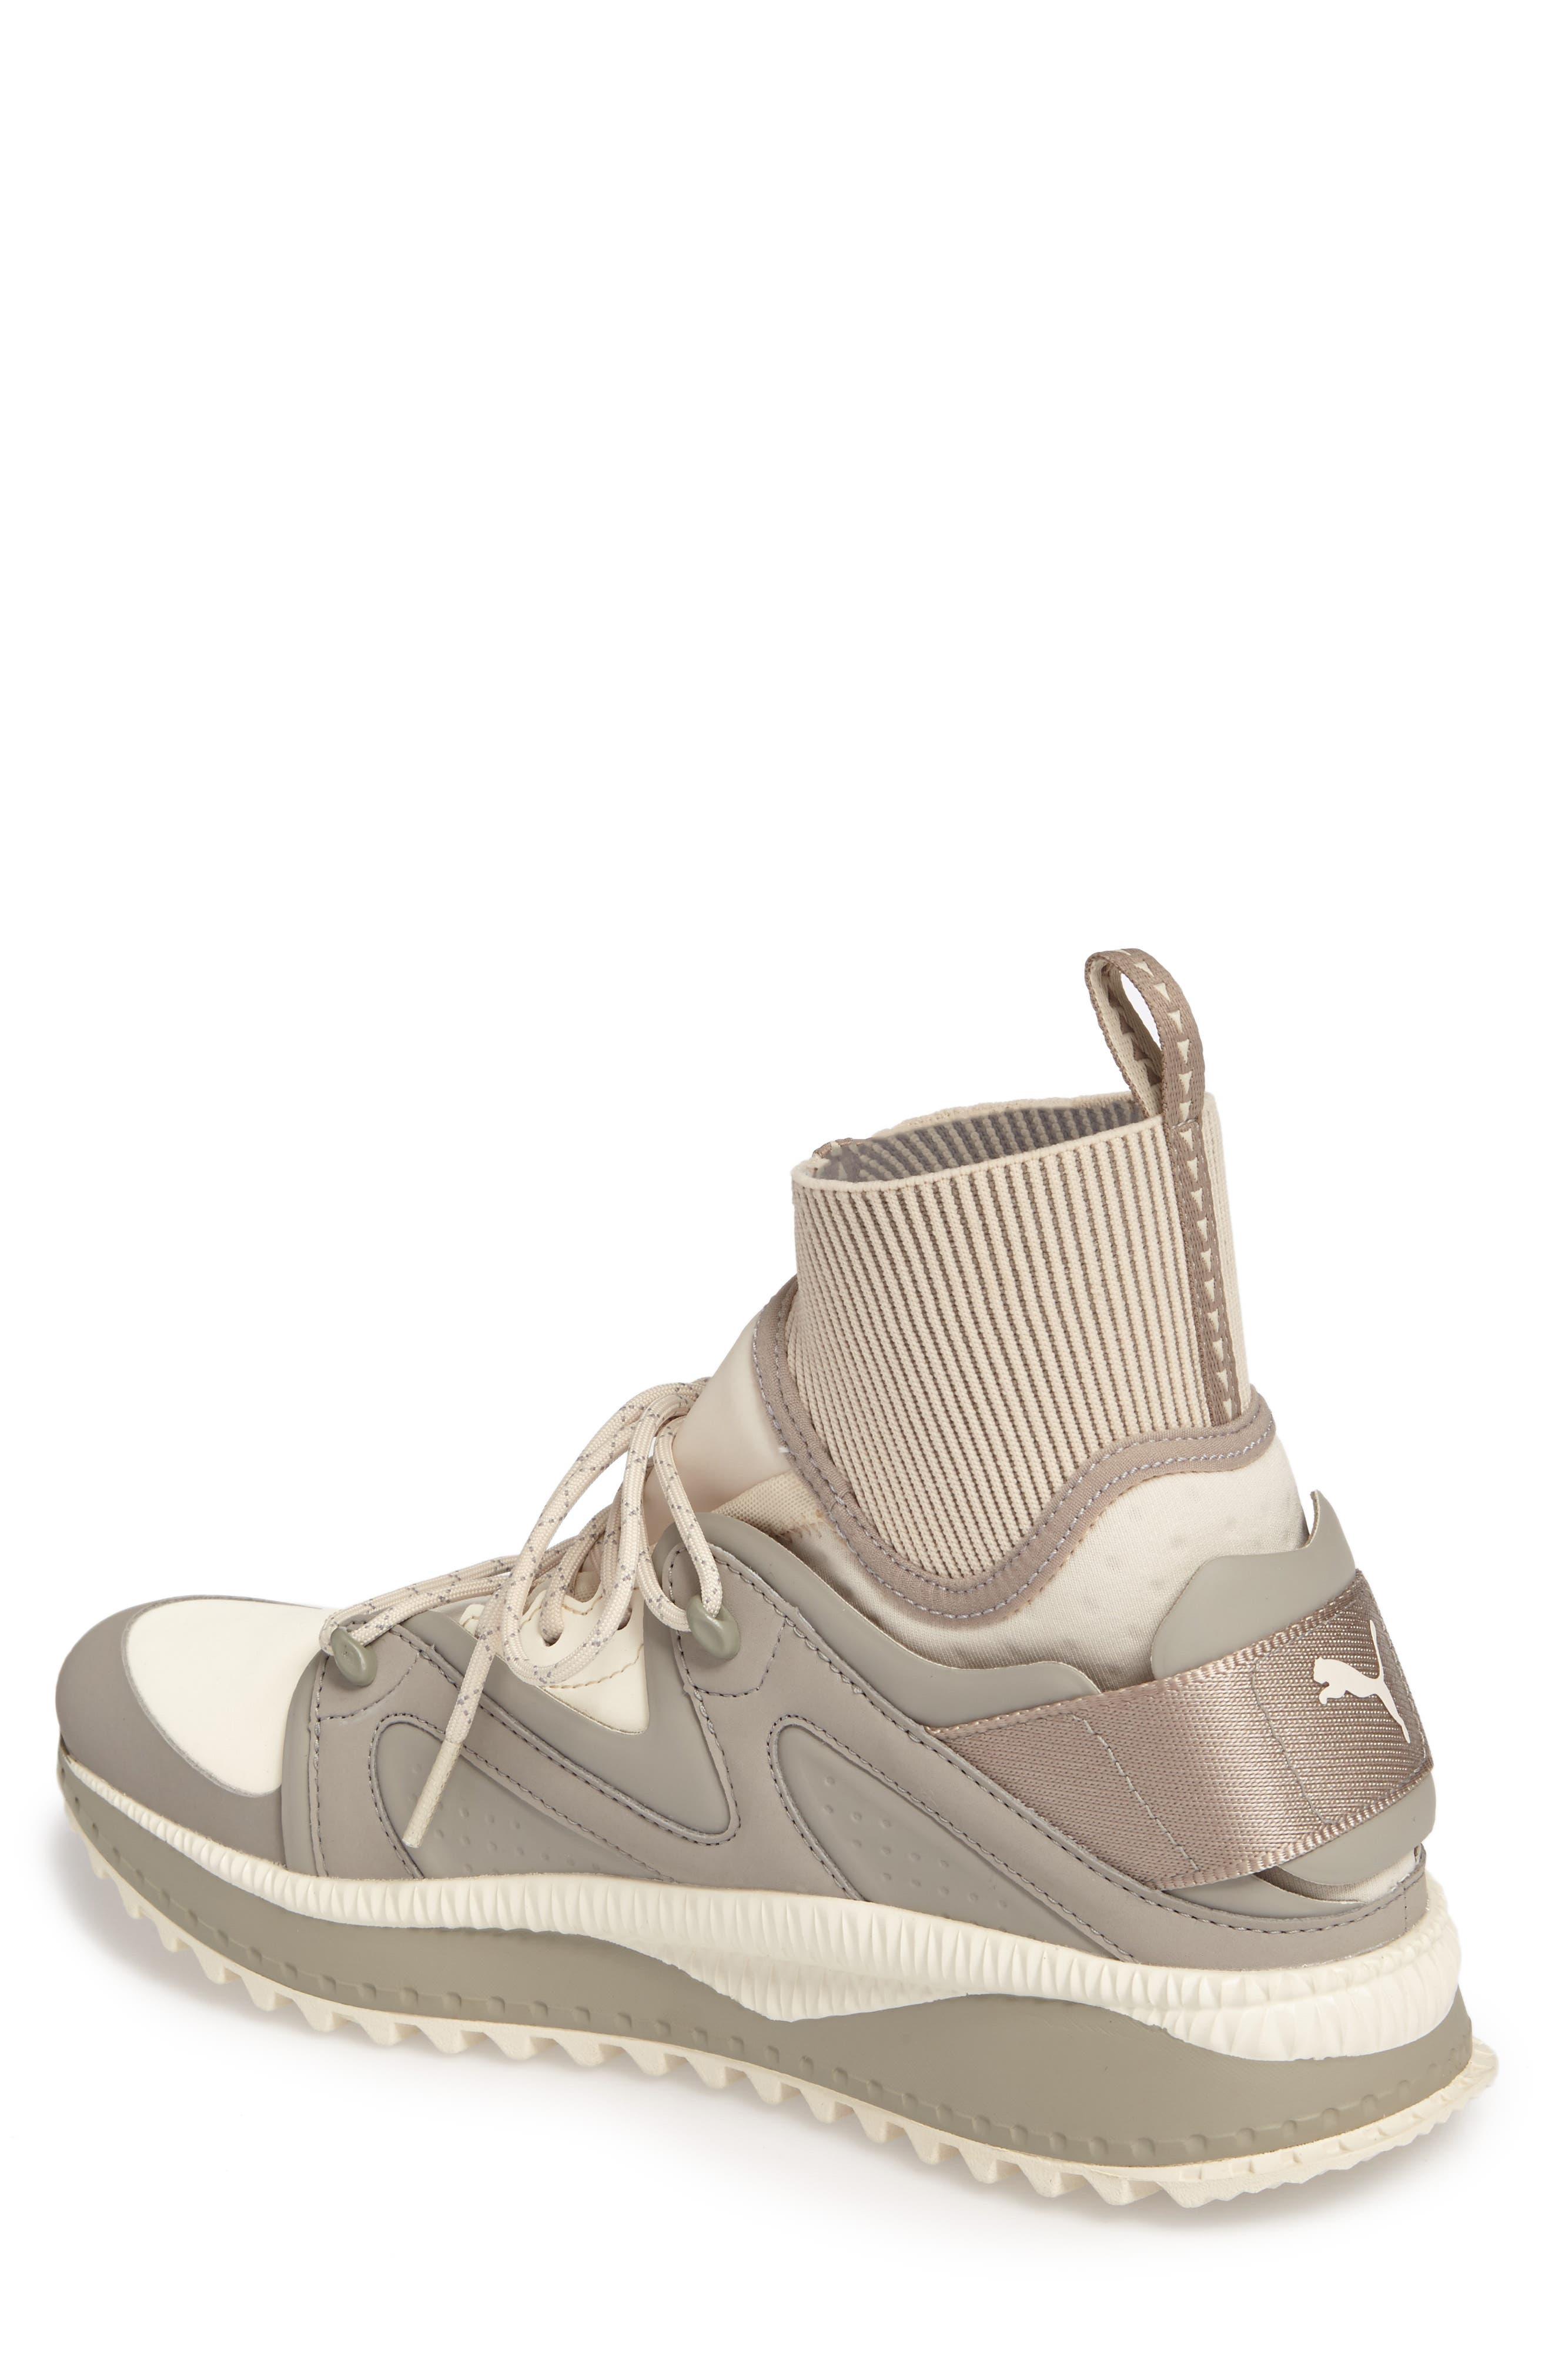 Tsugi Kori Sneaker,                             Alternate thumbnail 2, color,                             Rock Ridge/ Birch